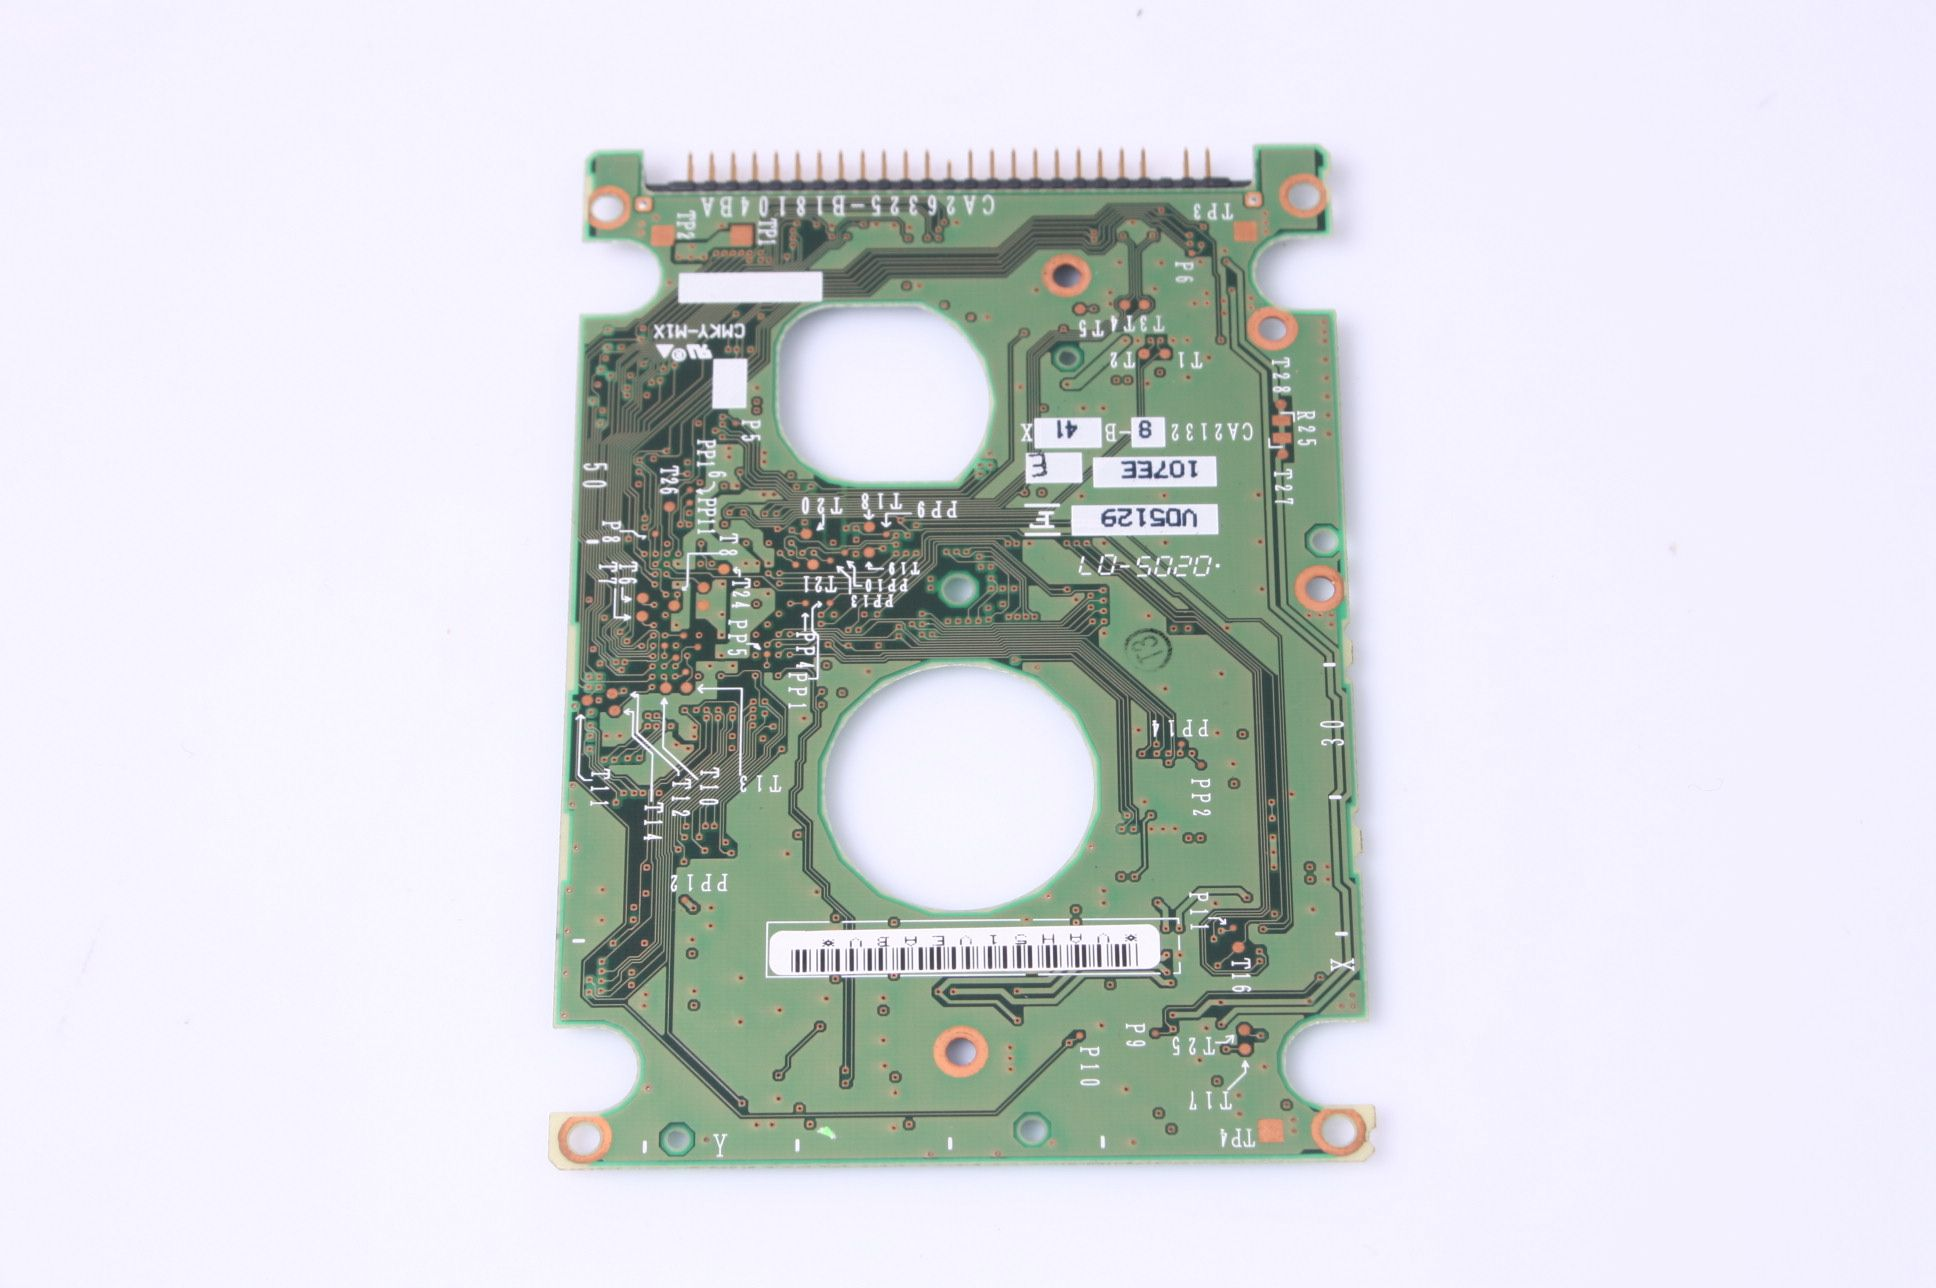 FUJITSU MHT2040AH 40GB 2.5 IDE HARD DRIVE / PCB (CIRCUIT BOARD) ONLY FOR DA